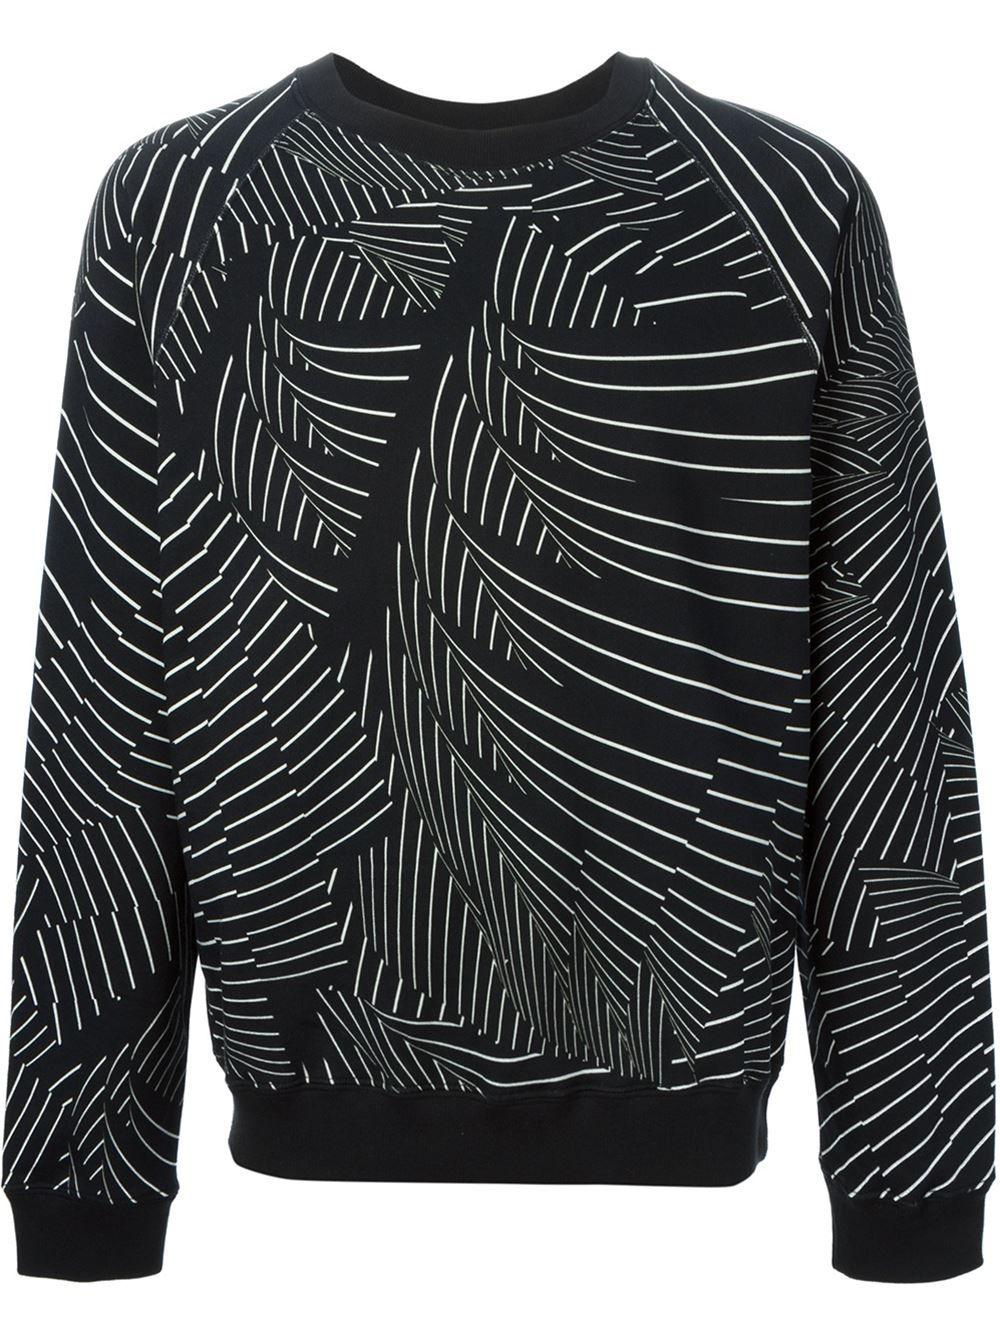 Christopher Kane Pages Print Sweatshirt - Minetti - Farfetch.com